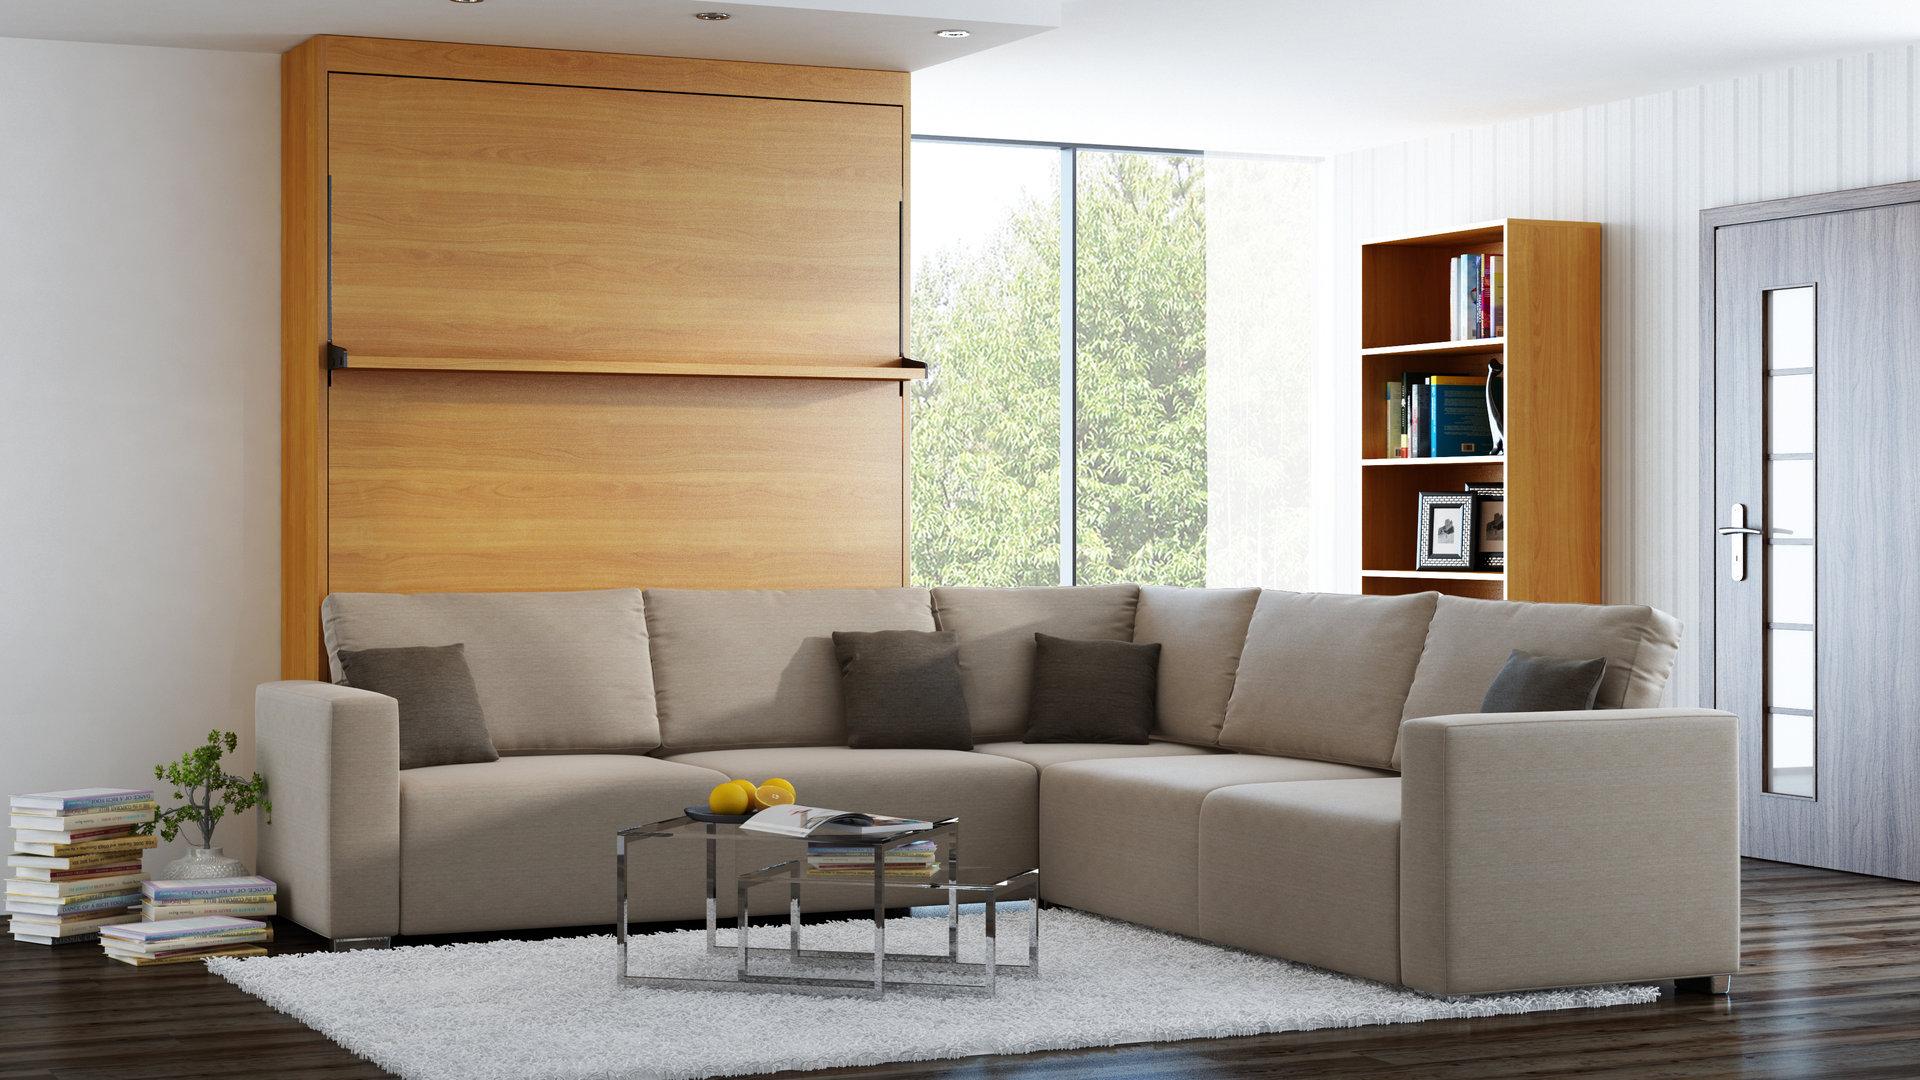 wandbett mit sofa ecke leggio linea std std 140 x 200 cm kirsche. Black Bedroom Furniture Sets. Home Design Ideas